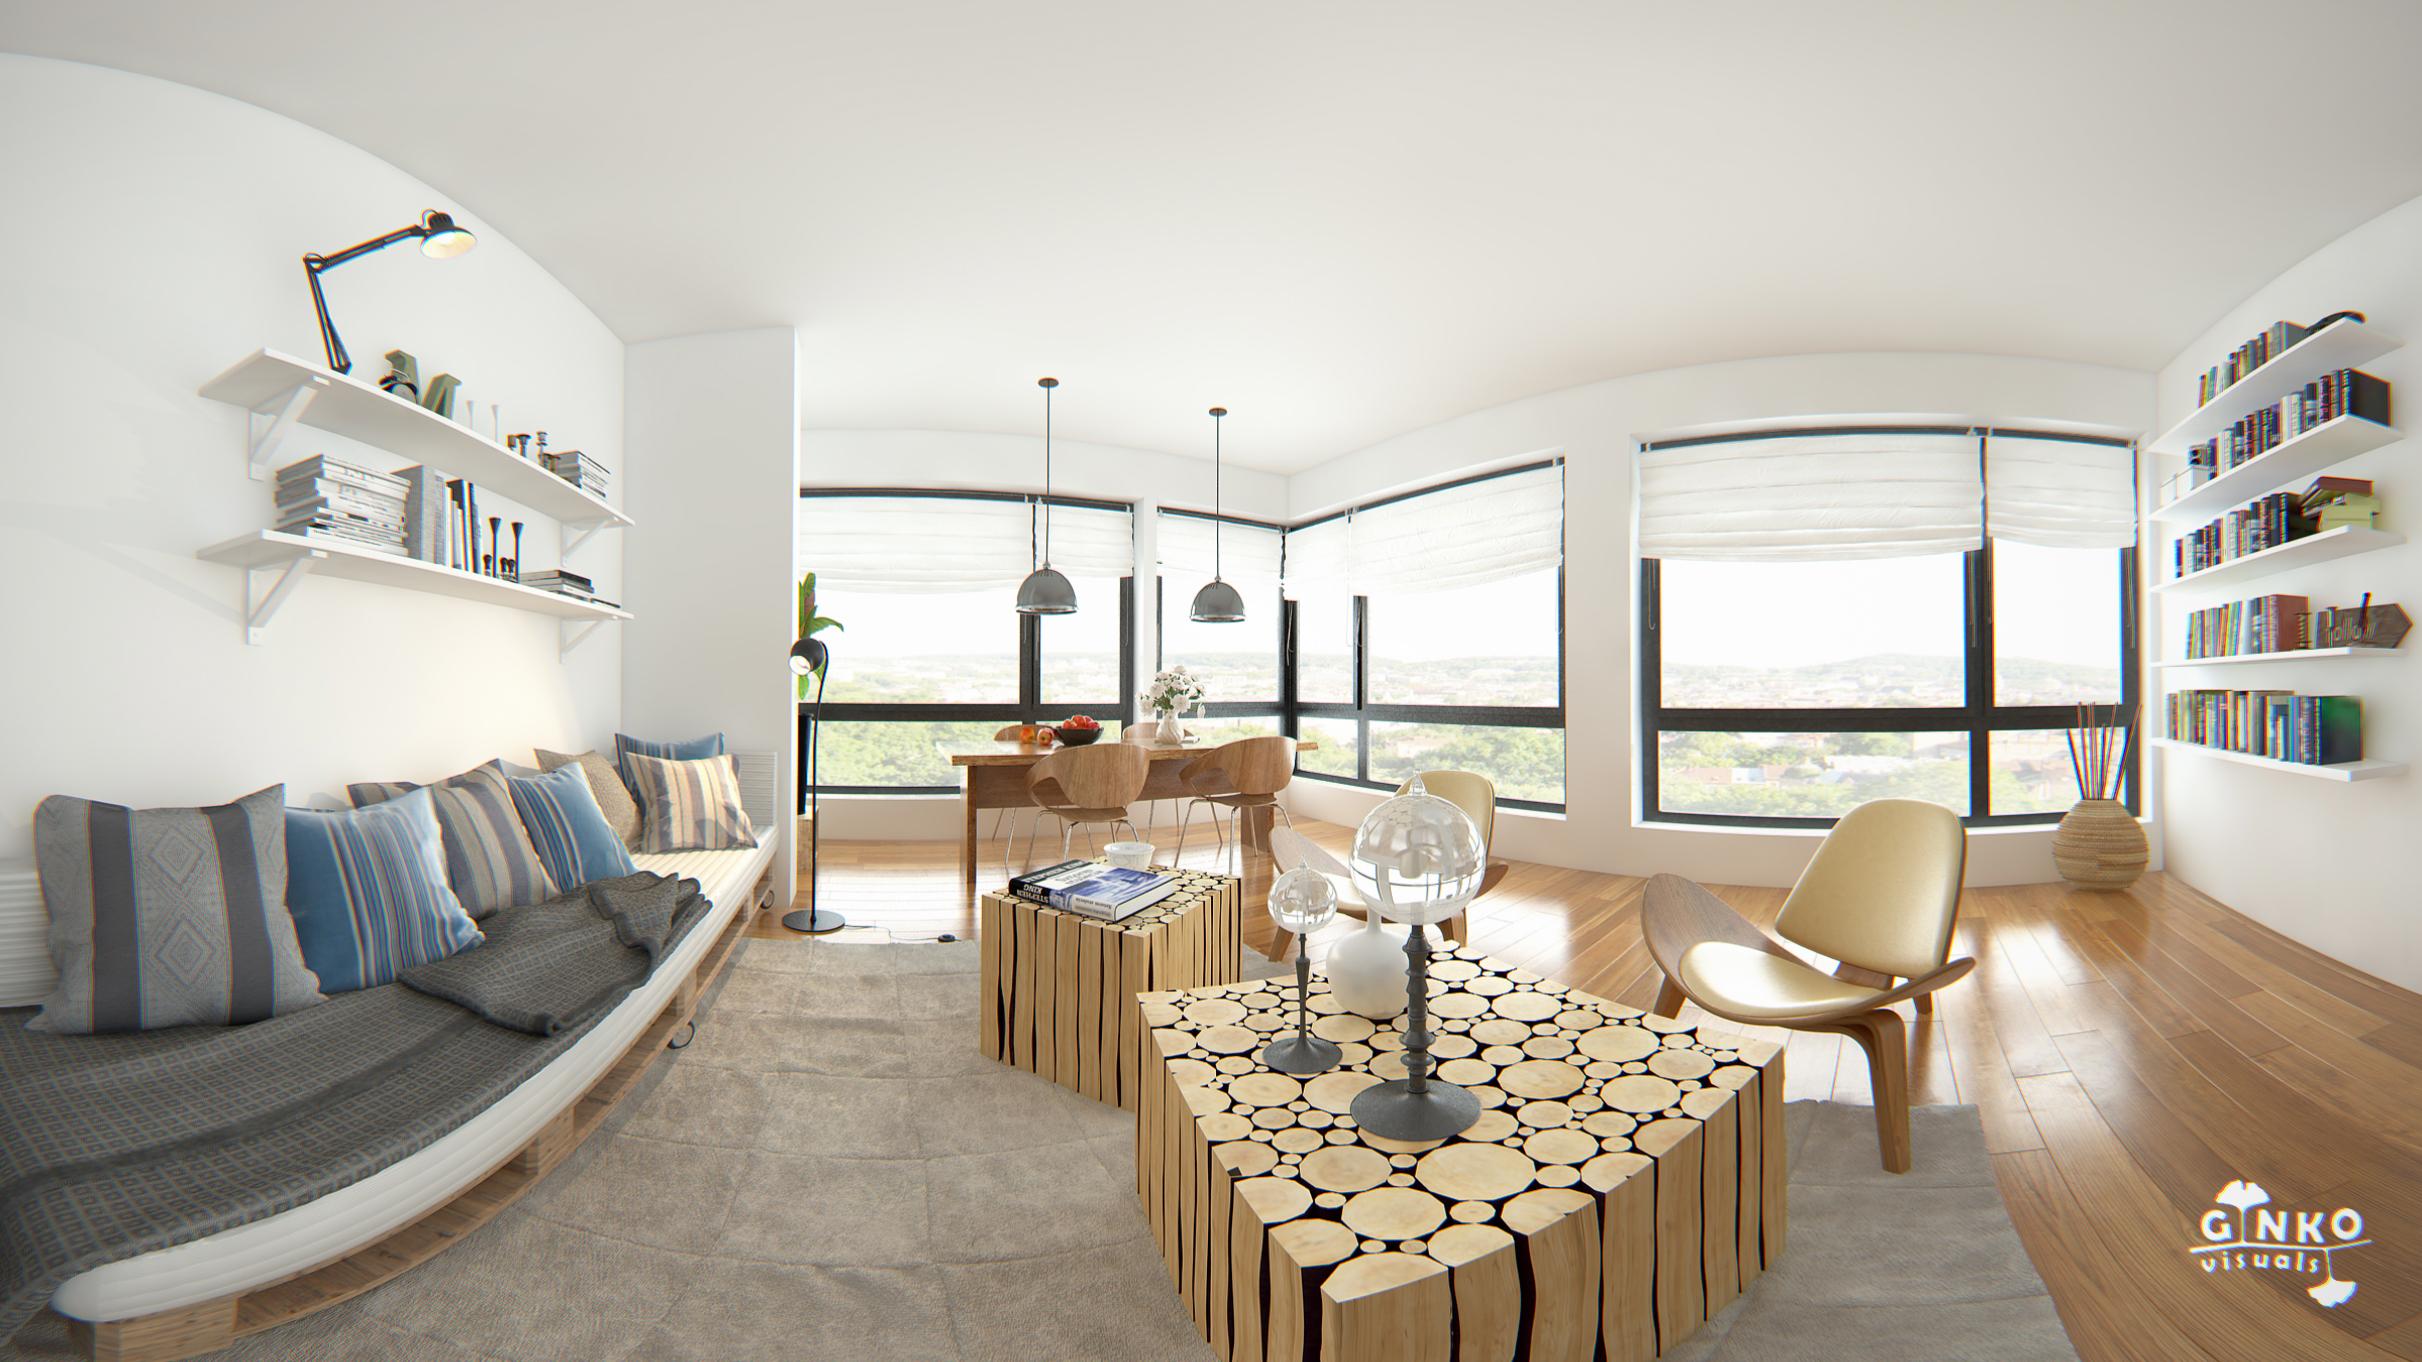 Interior design 3d model http ginkovis com videos